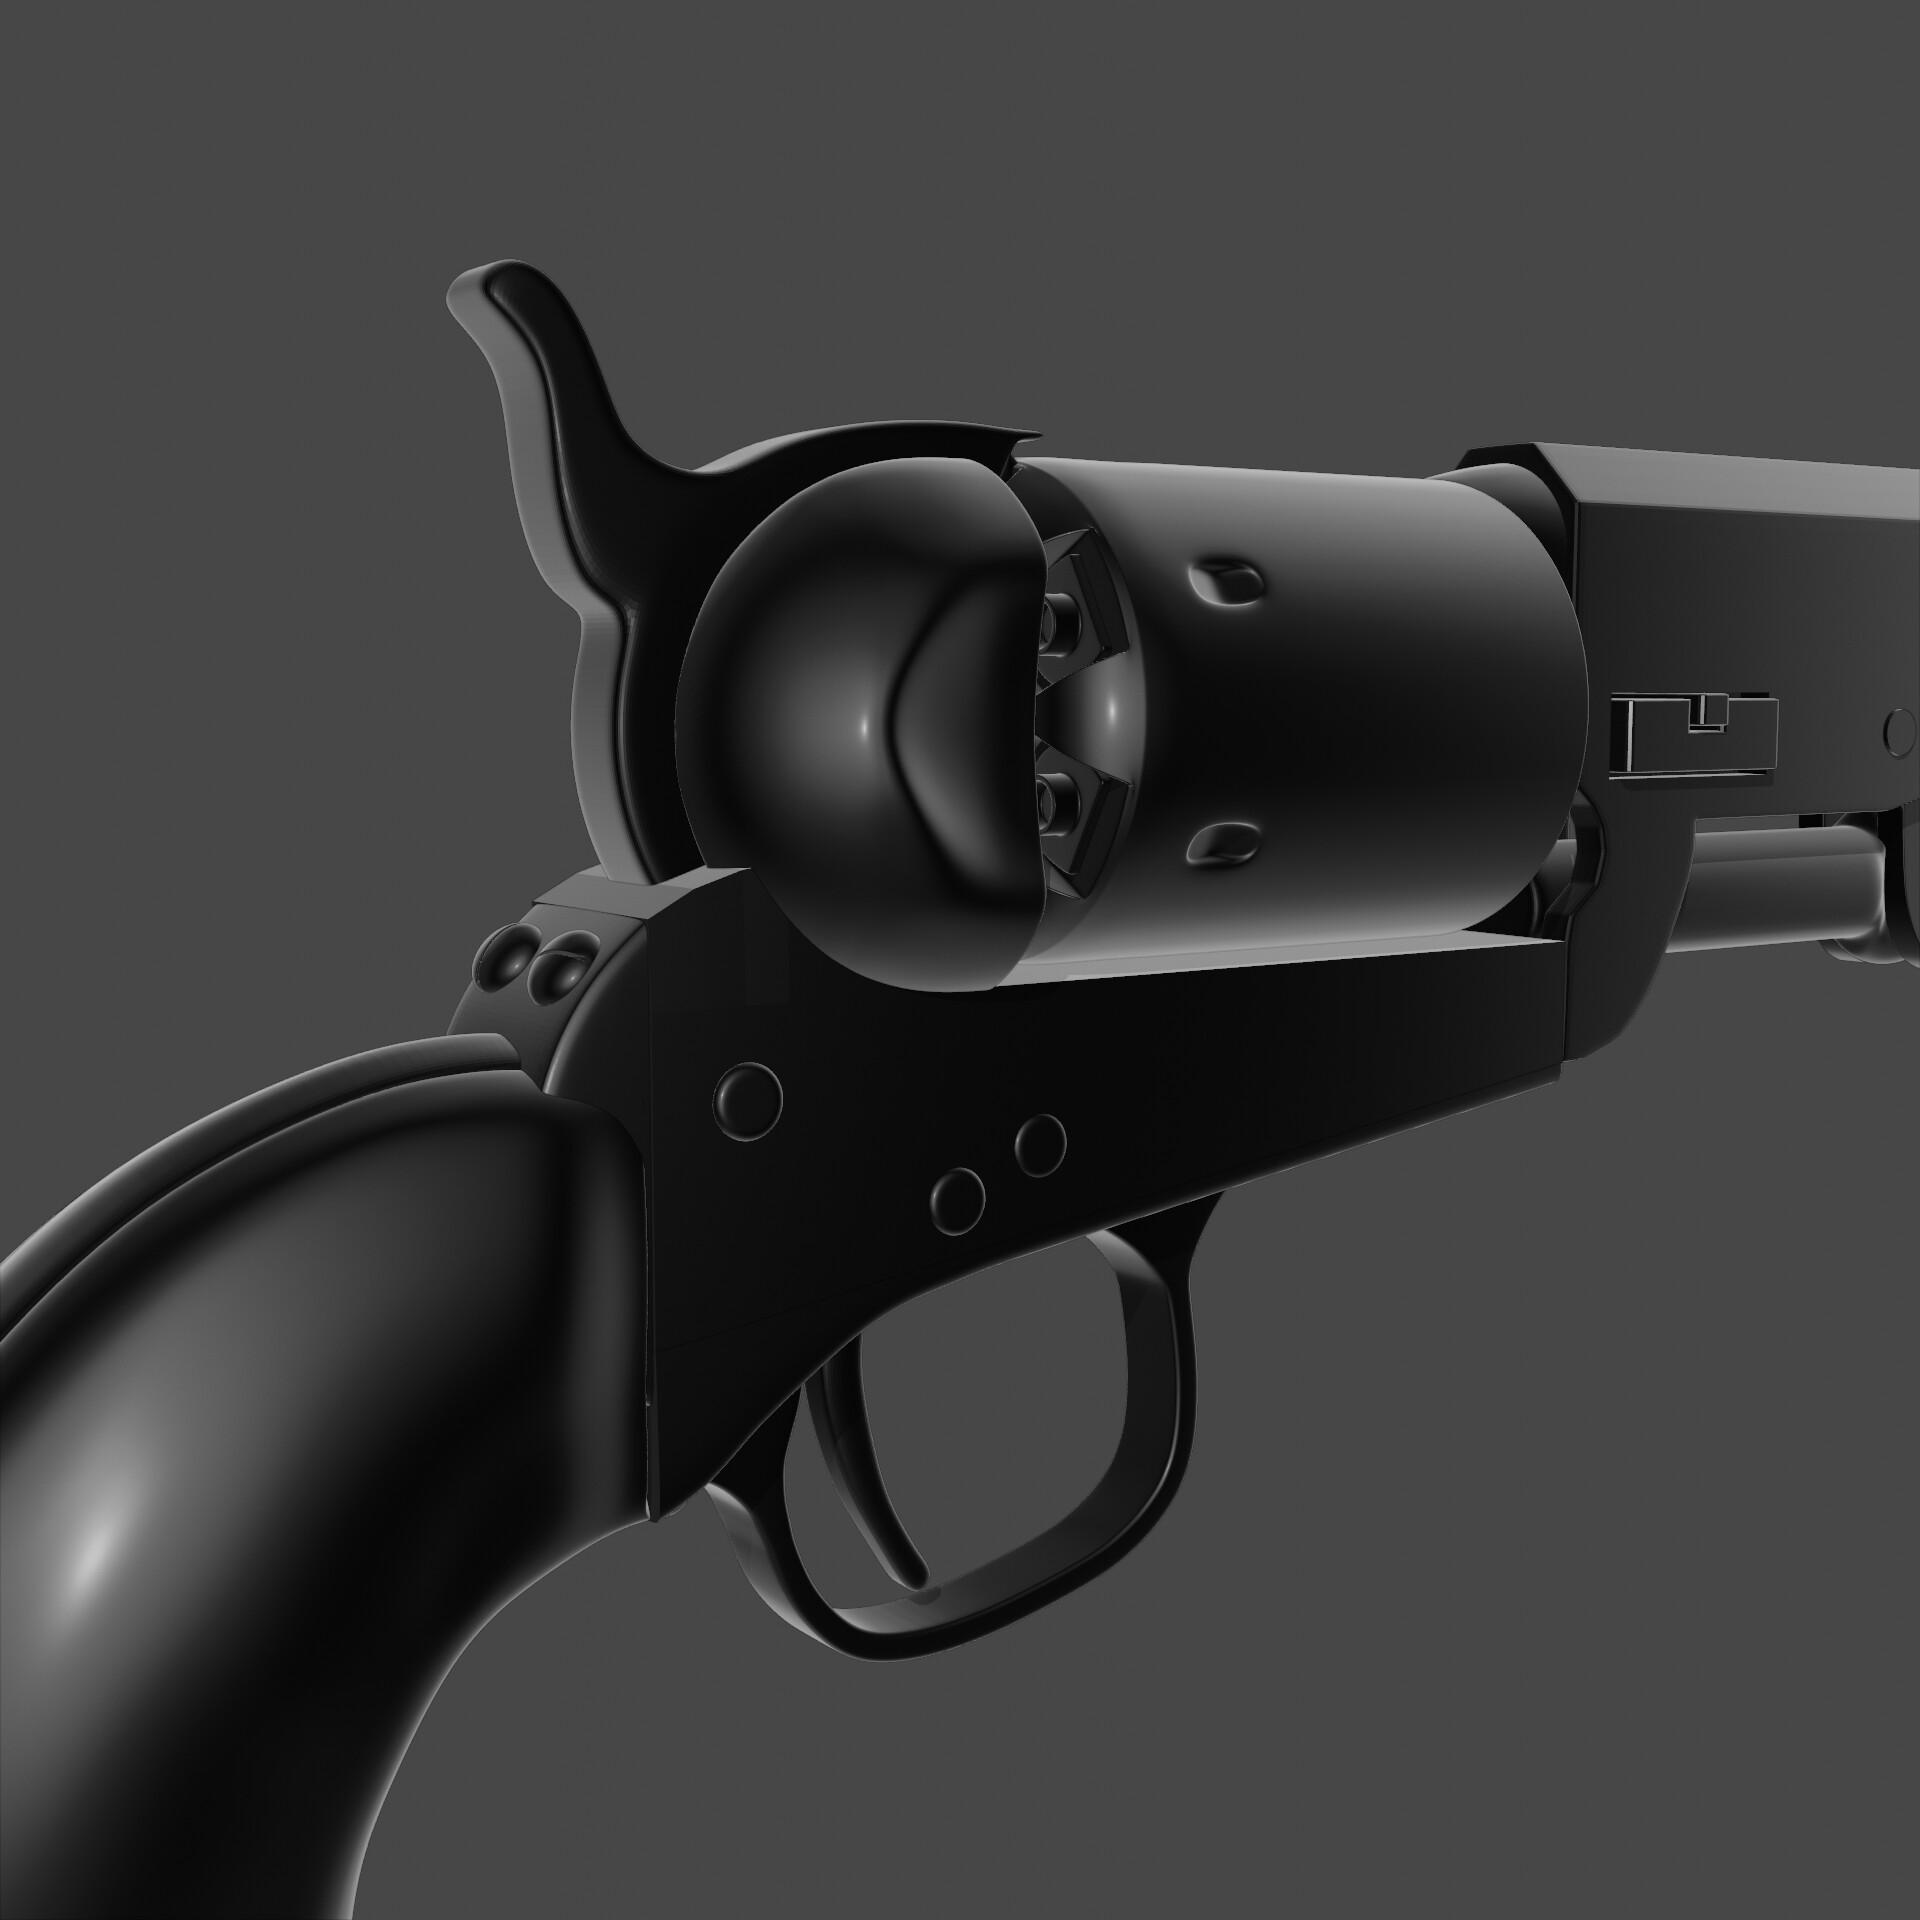 Colt 36, 1851